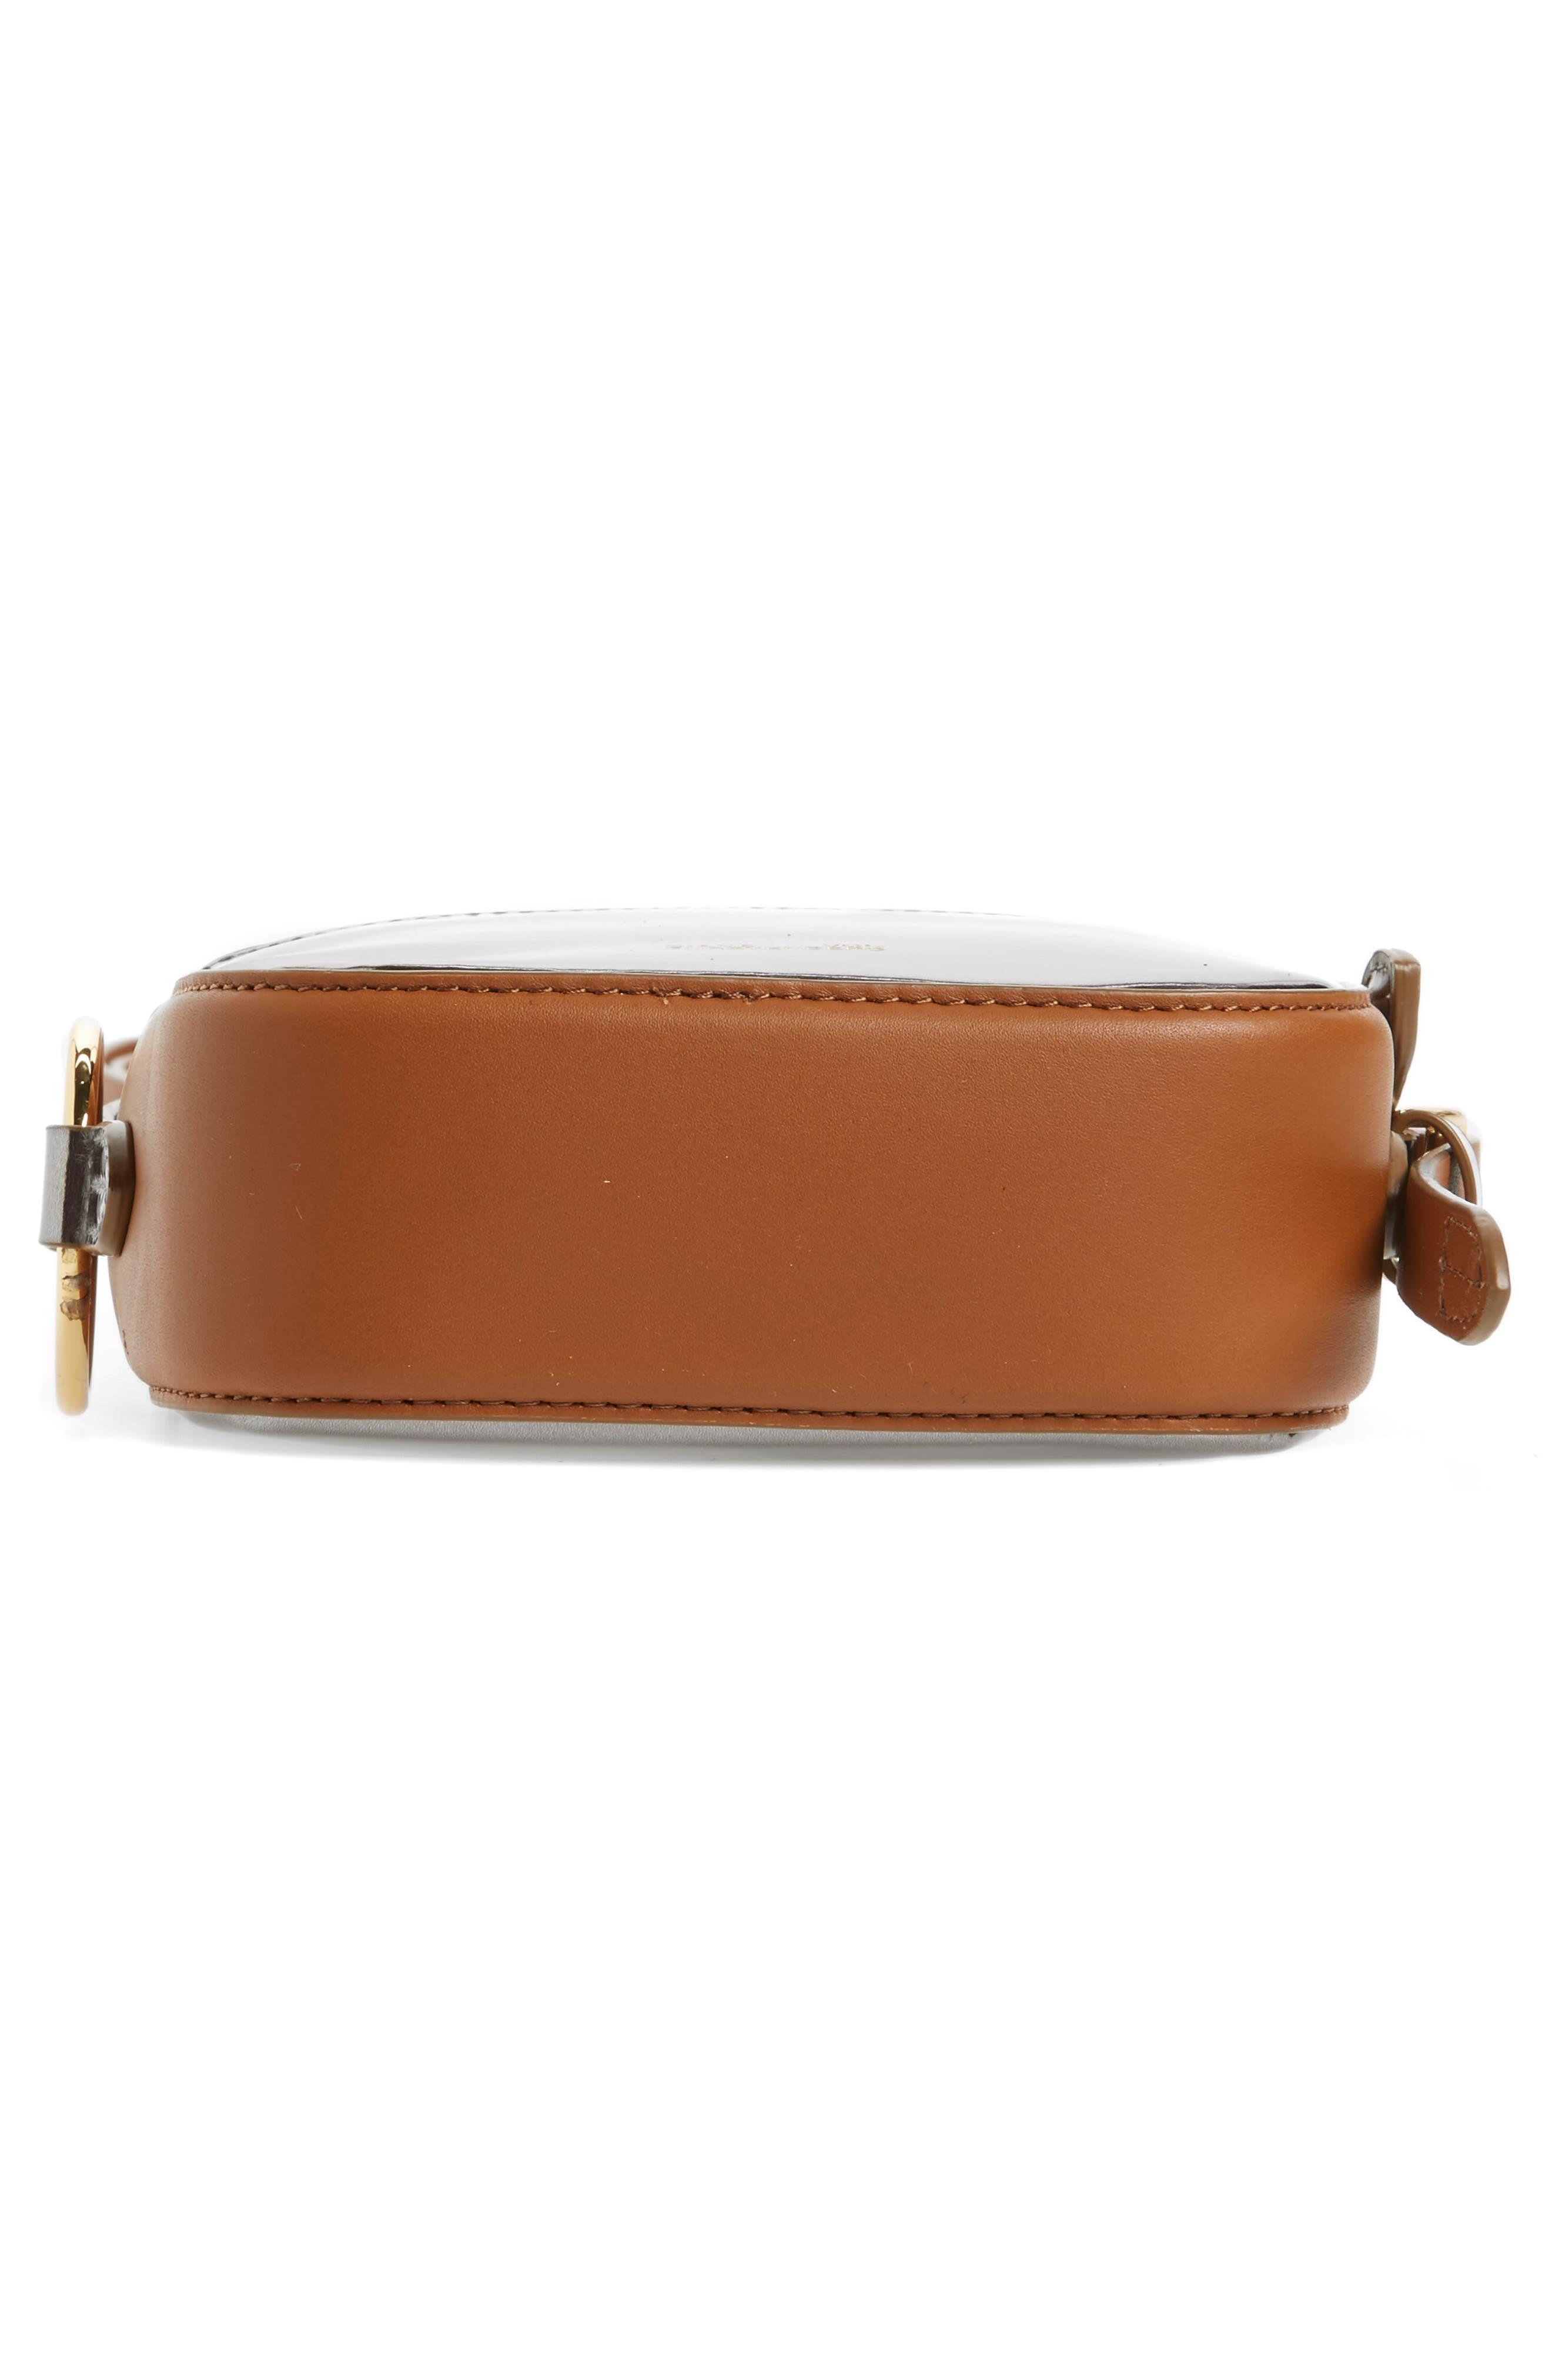 Specchio Leather Camera Bag,                             Alternate thumbnail 6, color,                             040